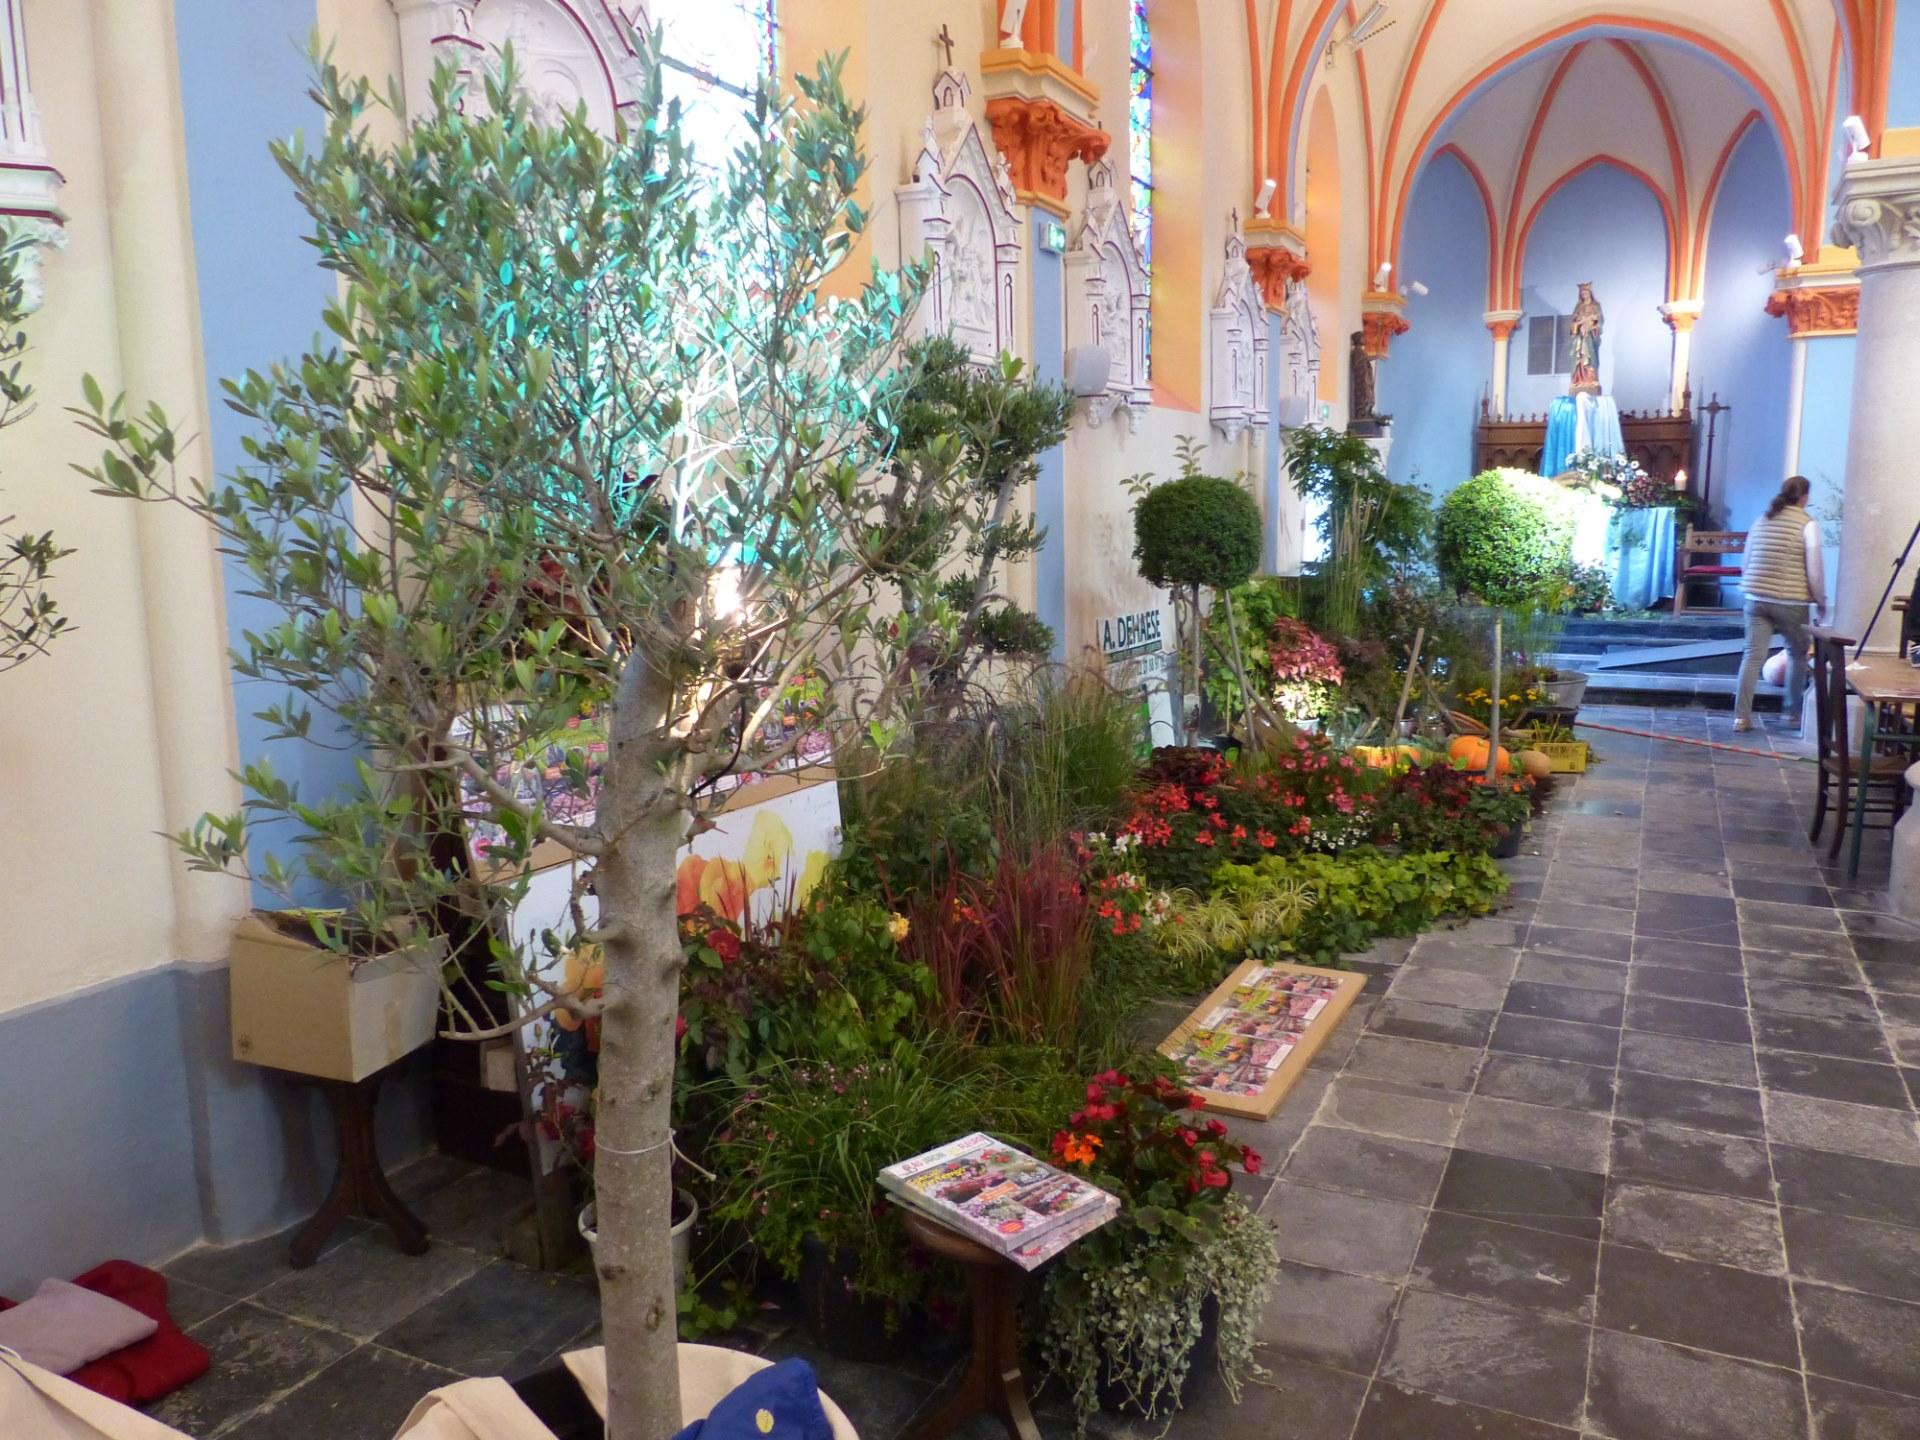 St Fiacre 19